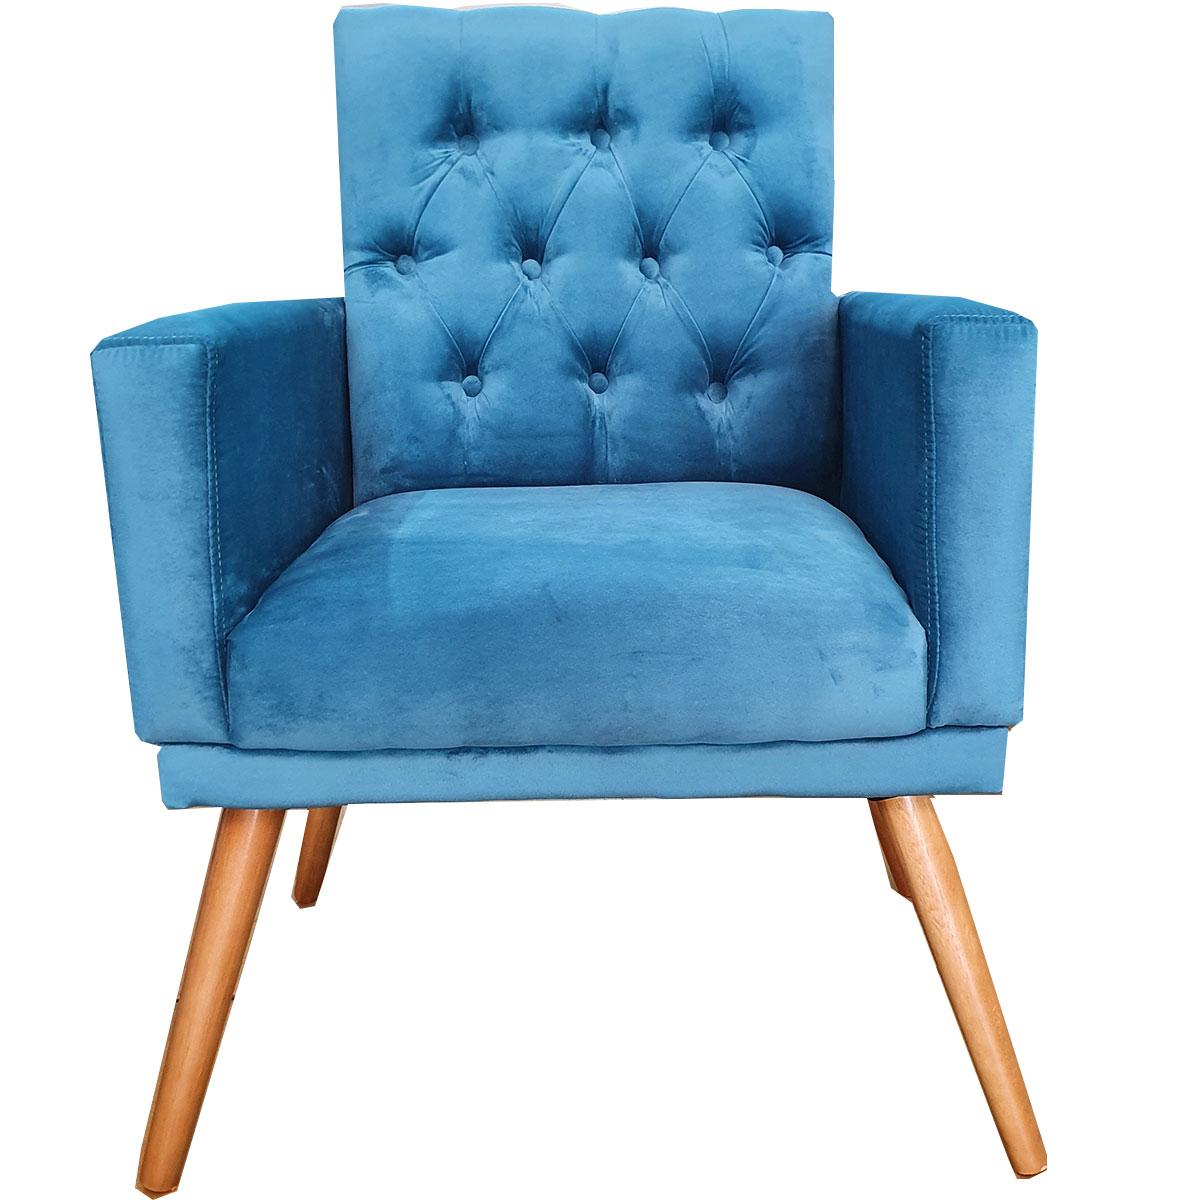 Poltrona Decorativa Alana Capitone Pé Palito Azul Turquesa